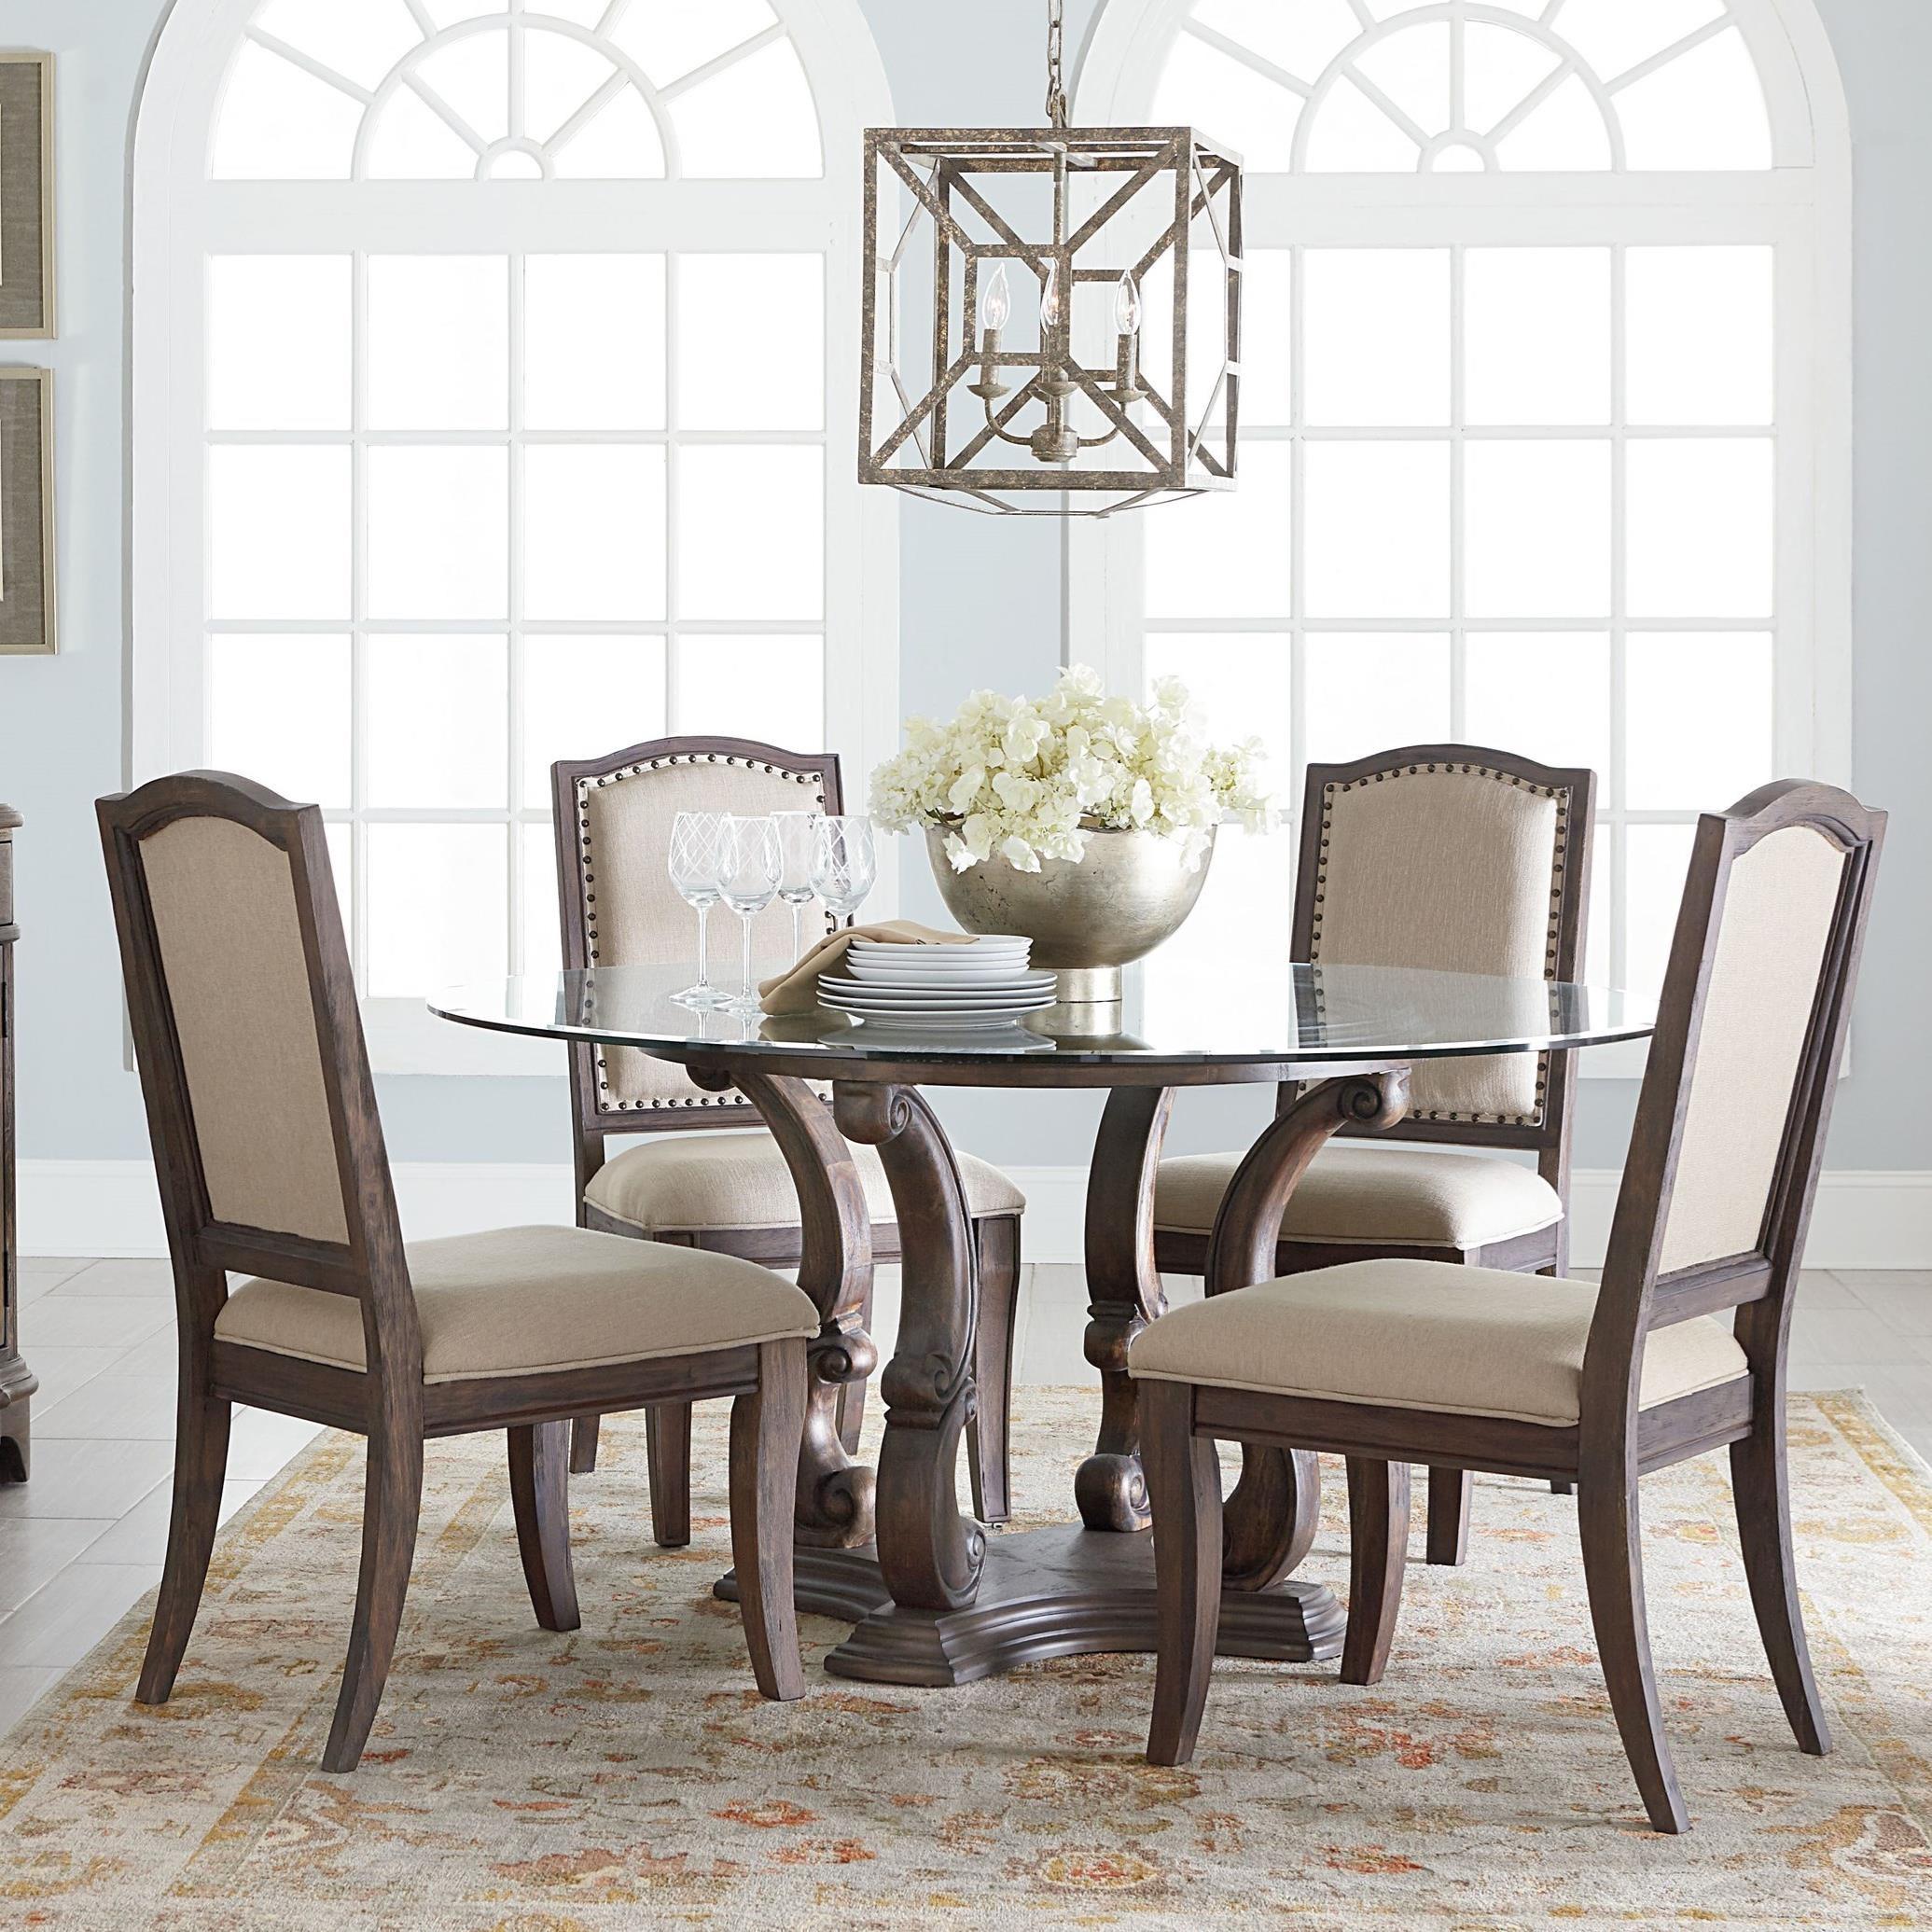 standard furniture parliament round table and chair set olinde 39 s furniture dining 5 piece sets. Black Bedroom Furniture Sets. Home Design Ideas